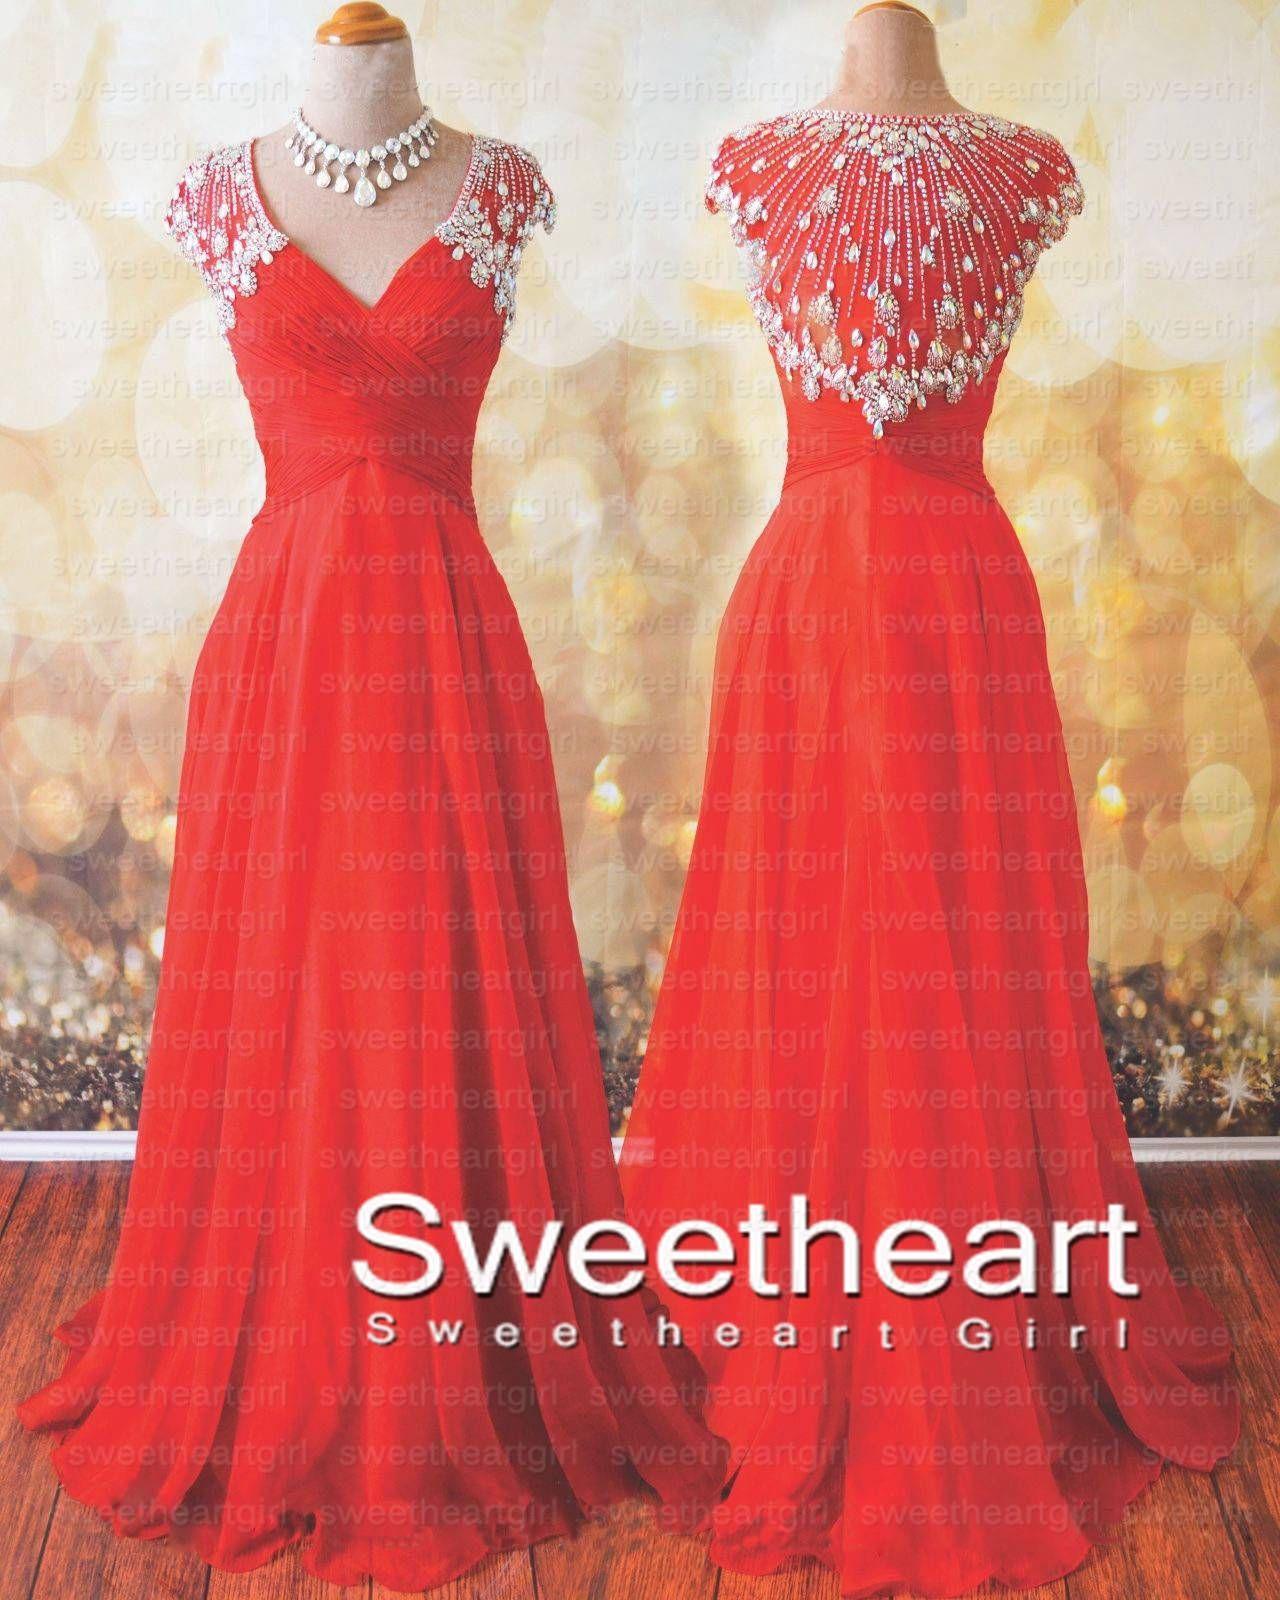 Sweetheart girl red v neck chiffon rhinestone long prom dress